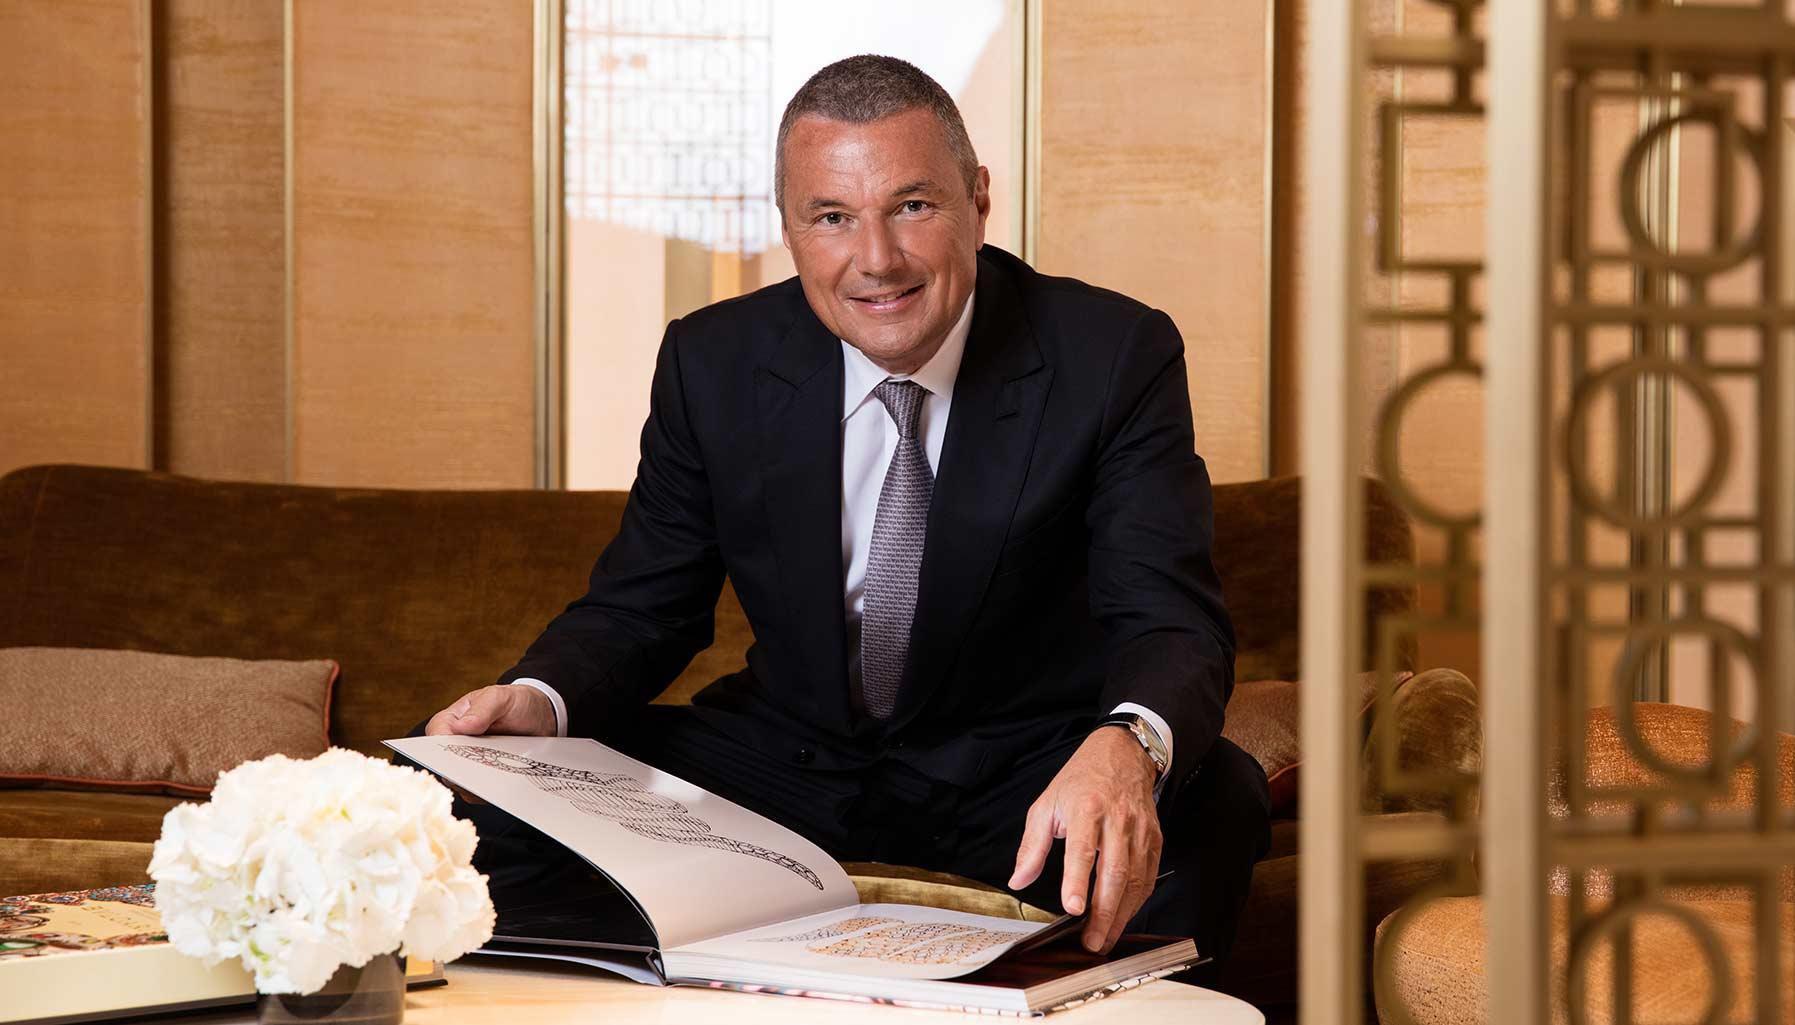 Jean-Christophe Babin, CEO of Bvlgari